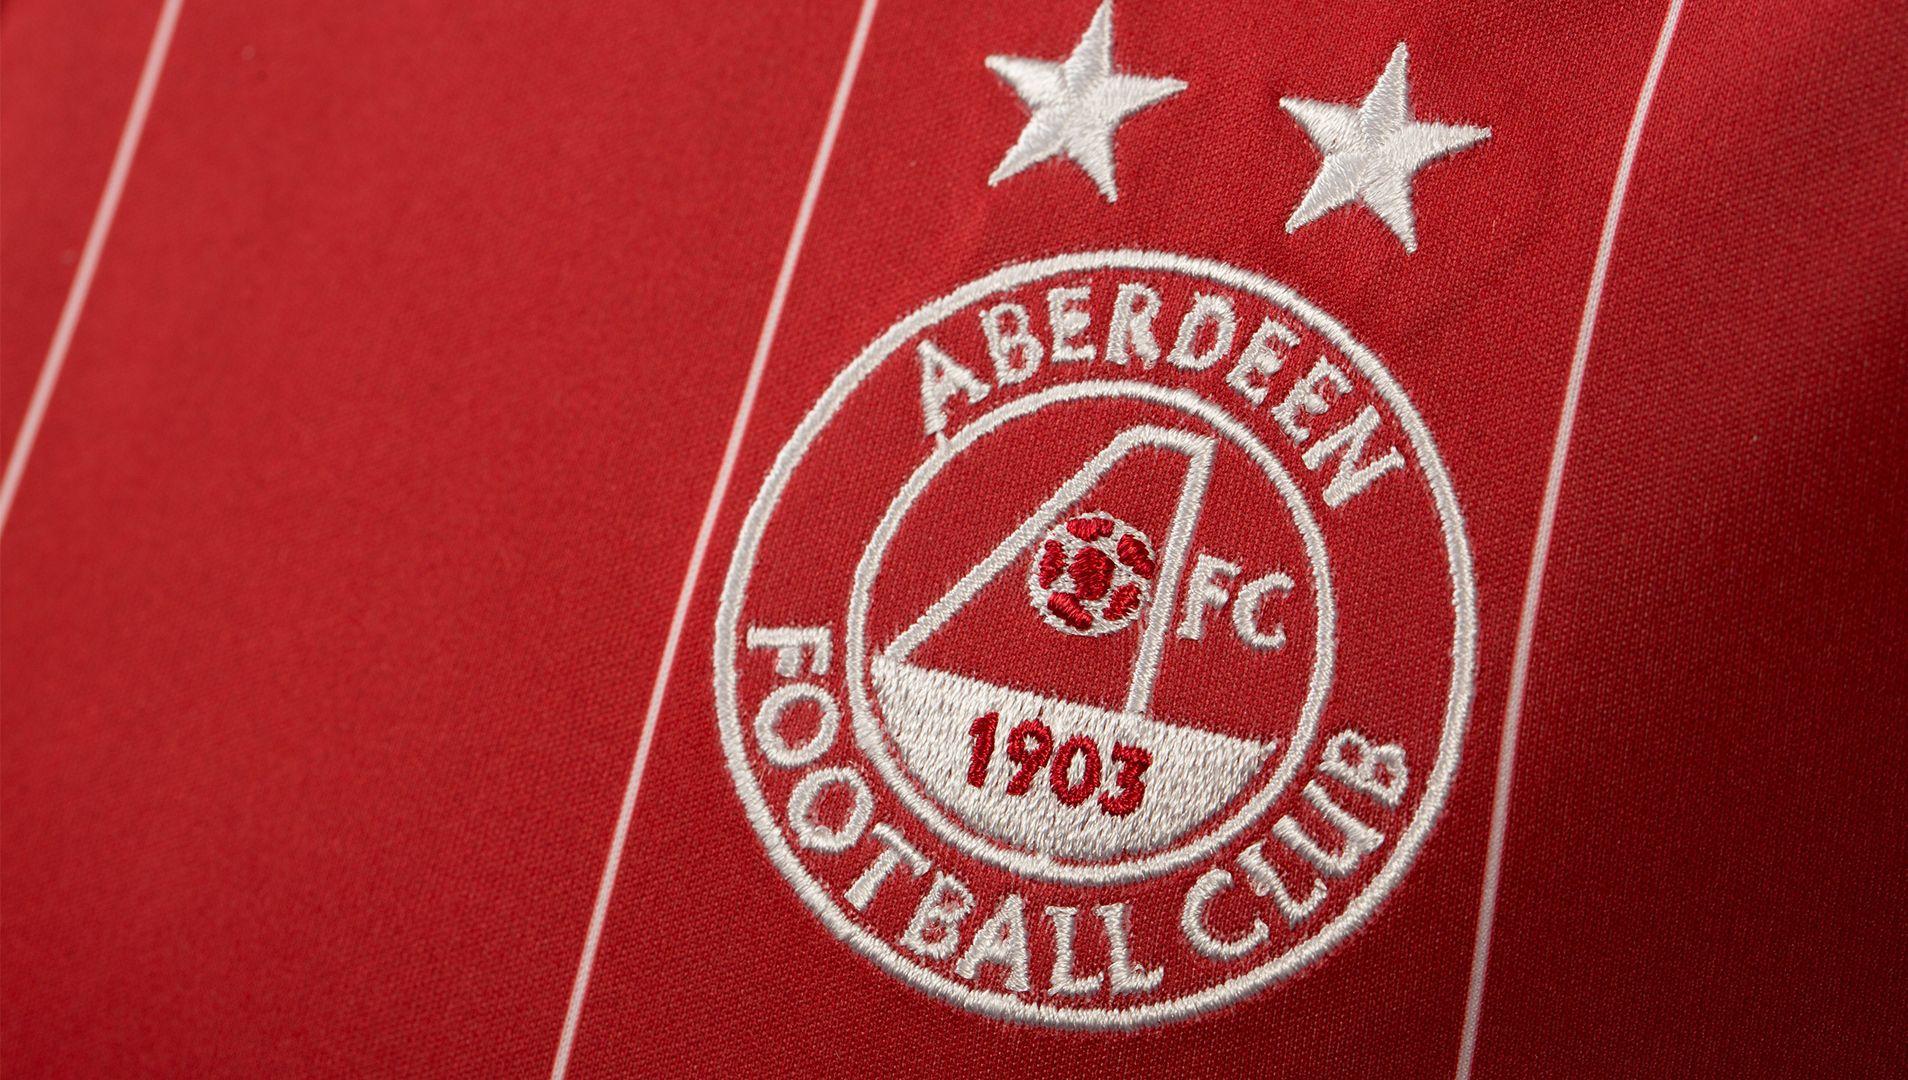 aberdeen chat Aberdeen fcs biggest independently run football forum and message board.